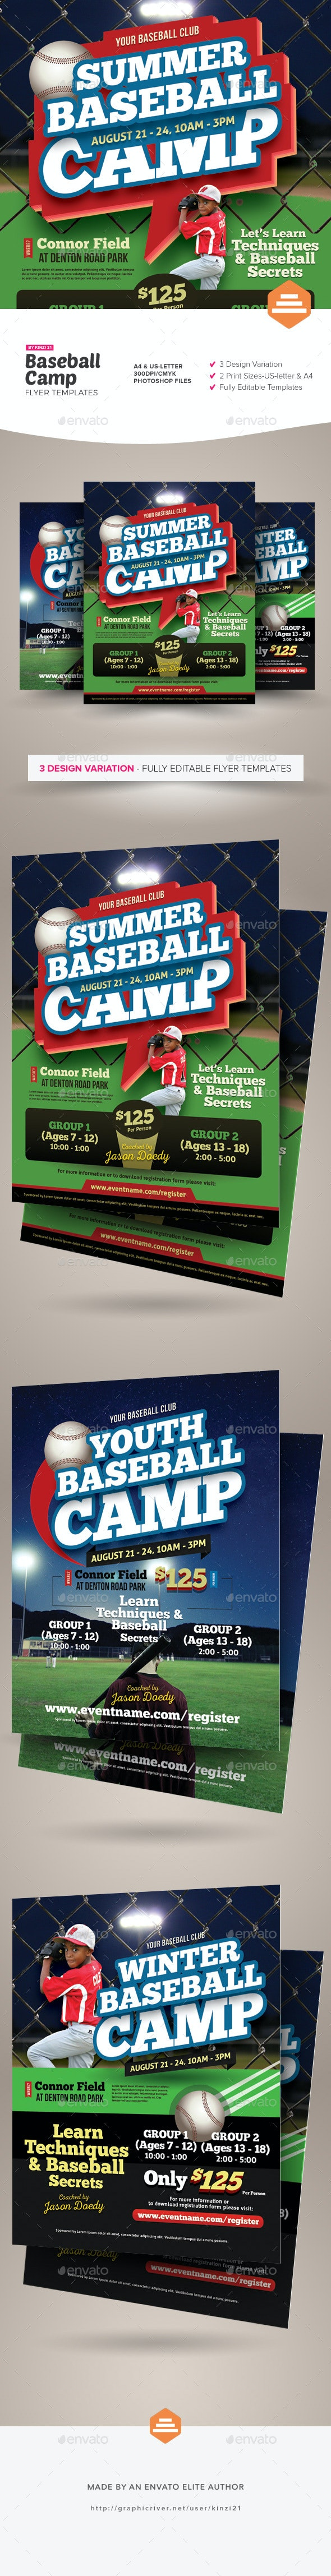 Baseball Camp Flyer Templates - Sports Events